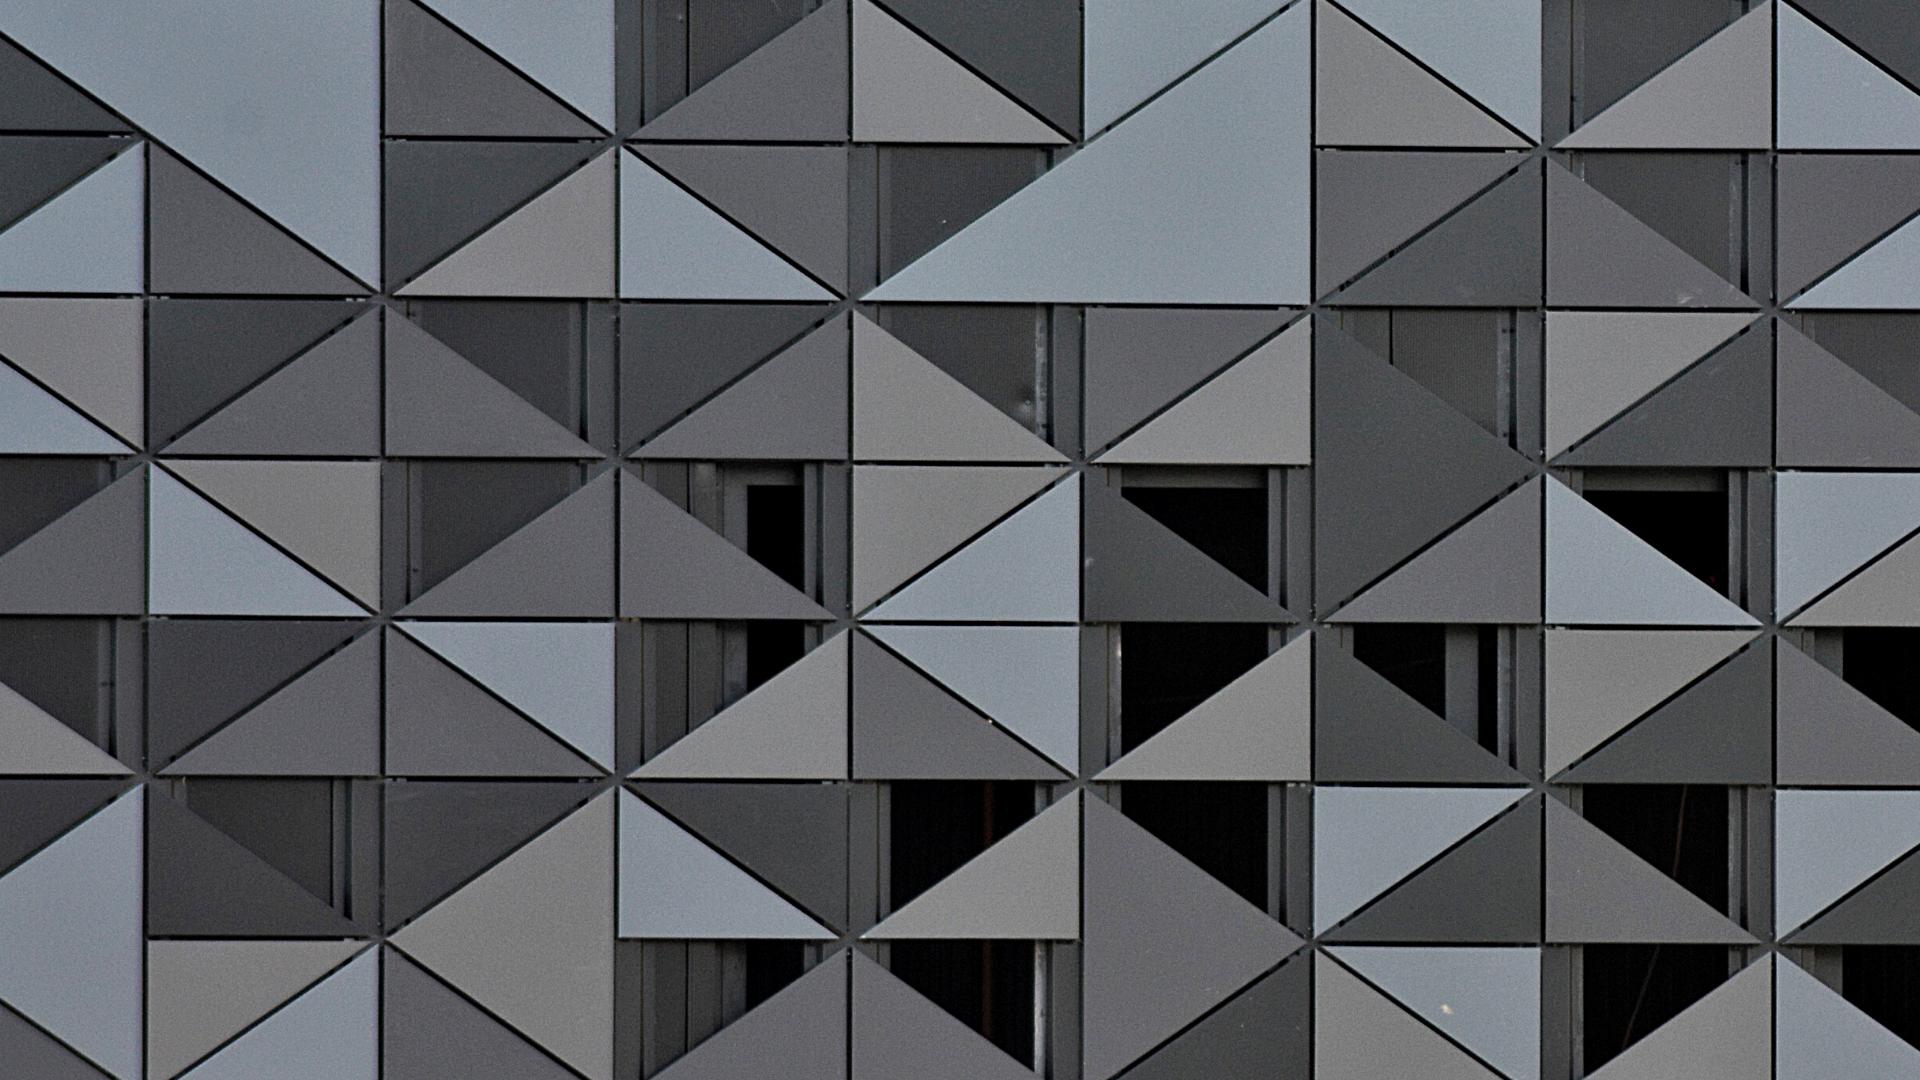 leuvehaven-paviljoen-alucobond-composiet-grey-triangle-allpro